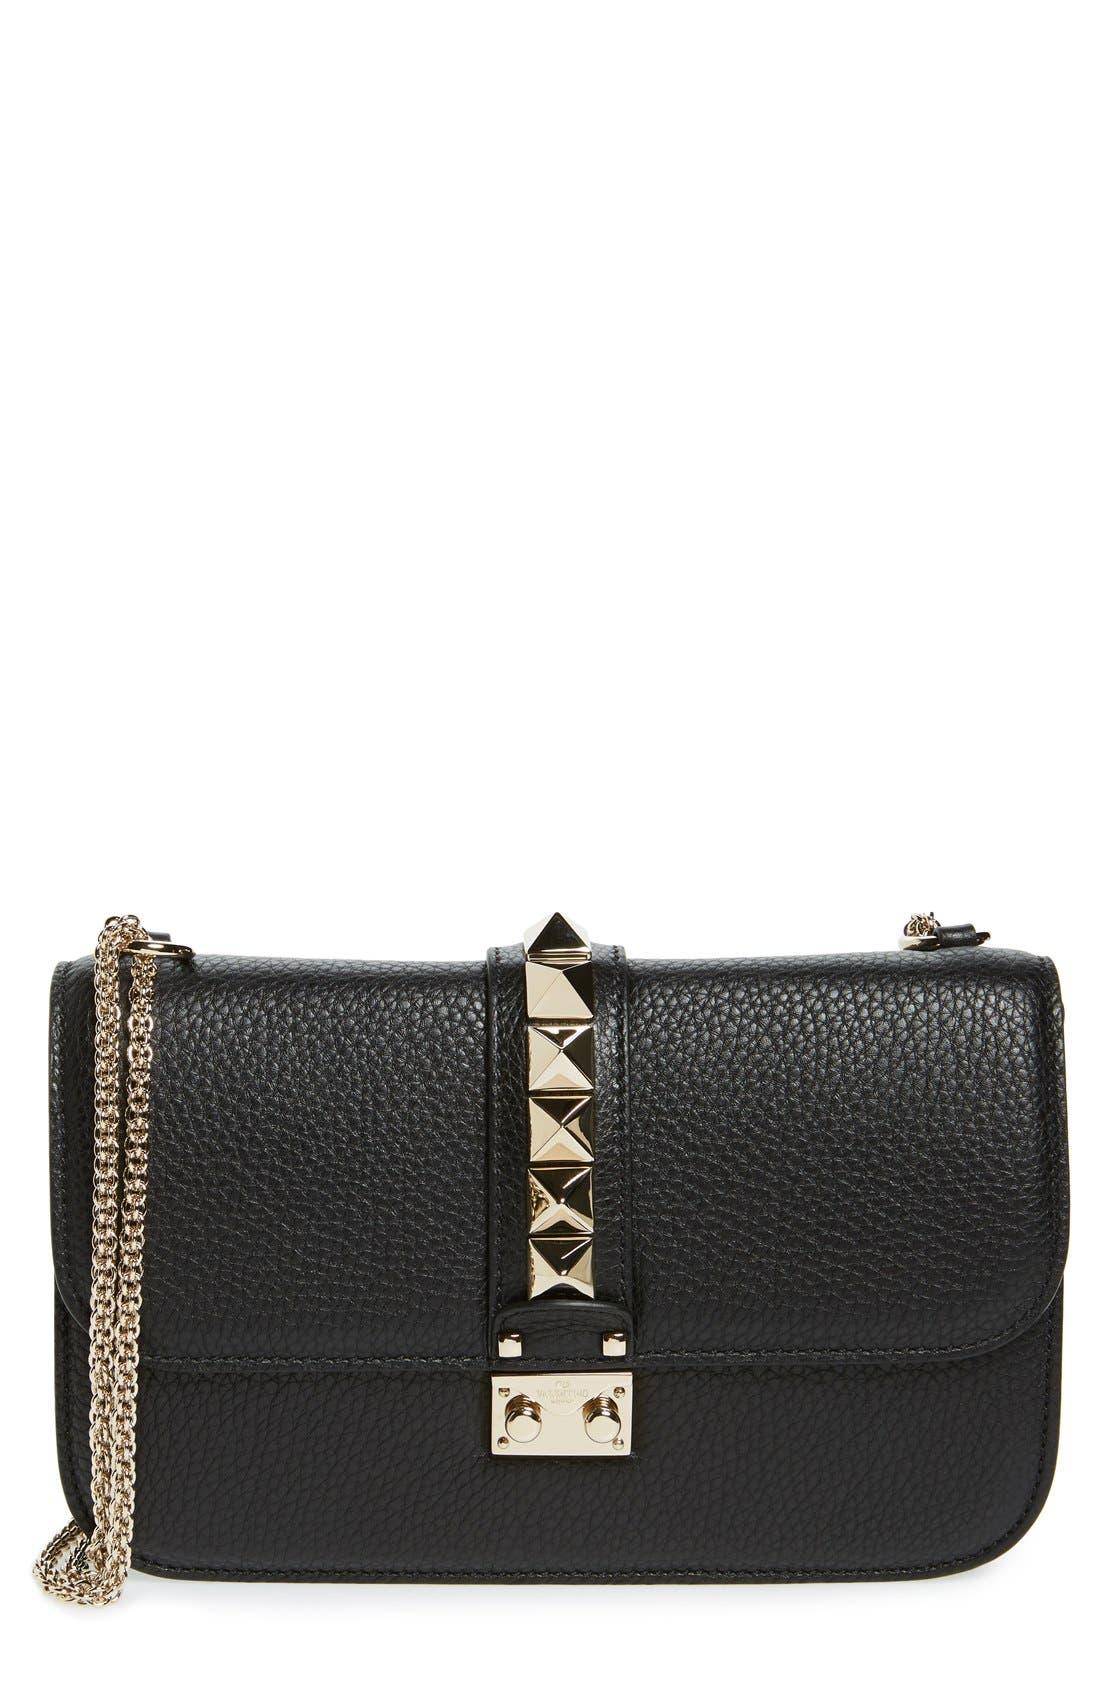 Alternate Image 1 Selected - VALENTINO GARAVANI Medium Lock Studded Leather Shoulder Bag